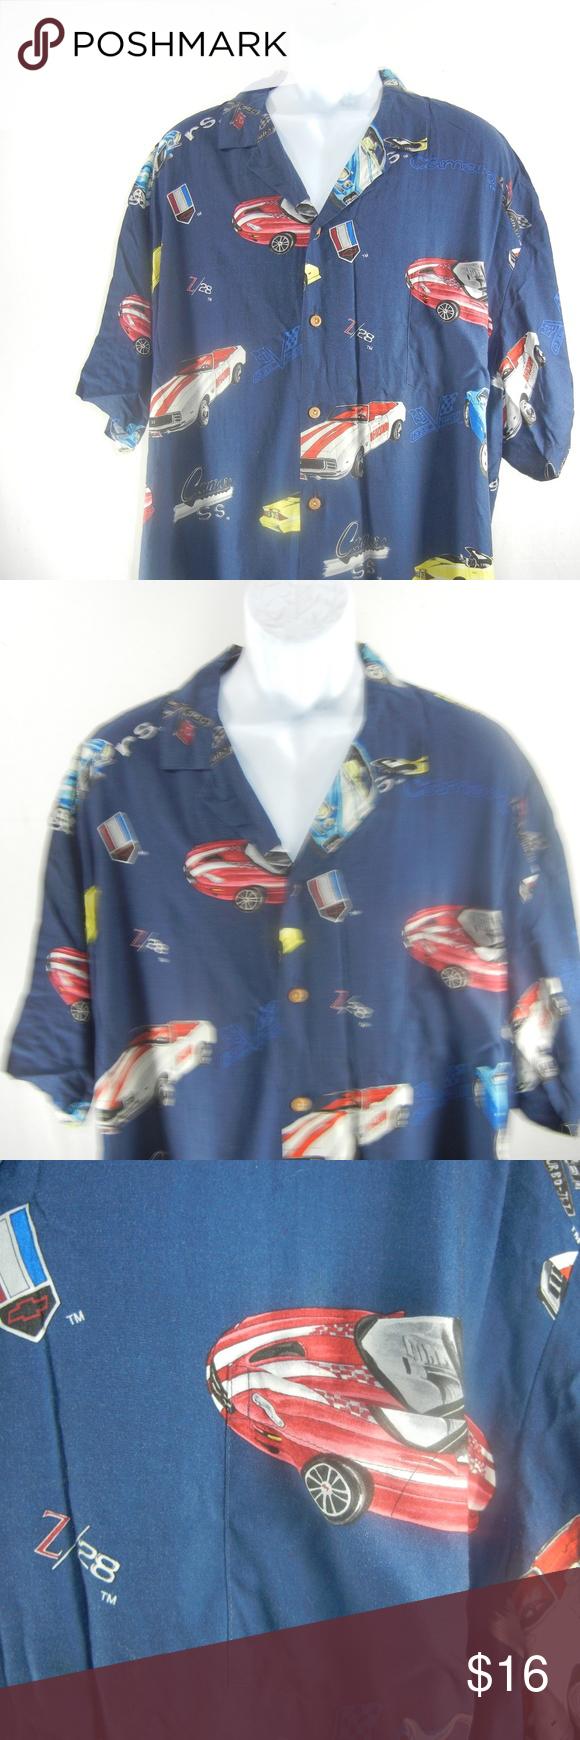 Paradise Found Size 3XLarge Chevy Camero Shirt Brand